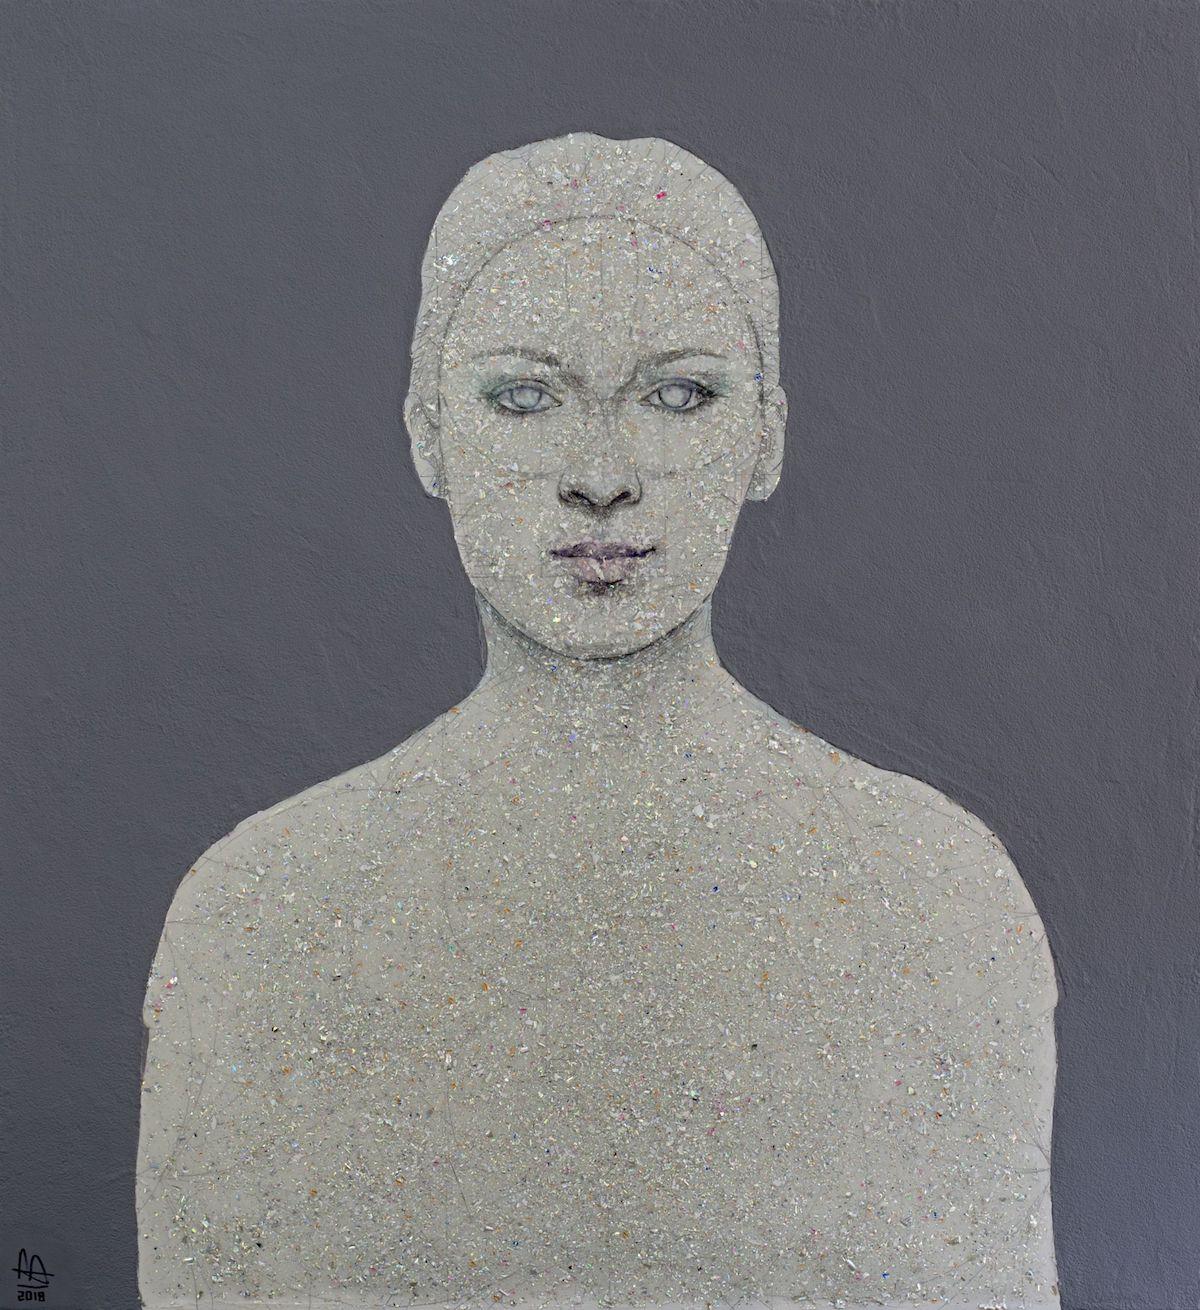 Technology Art by Nick Gentry